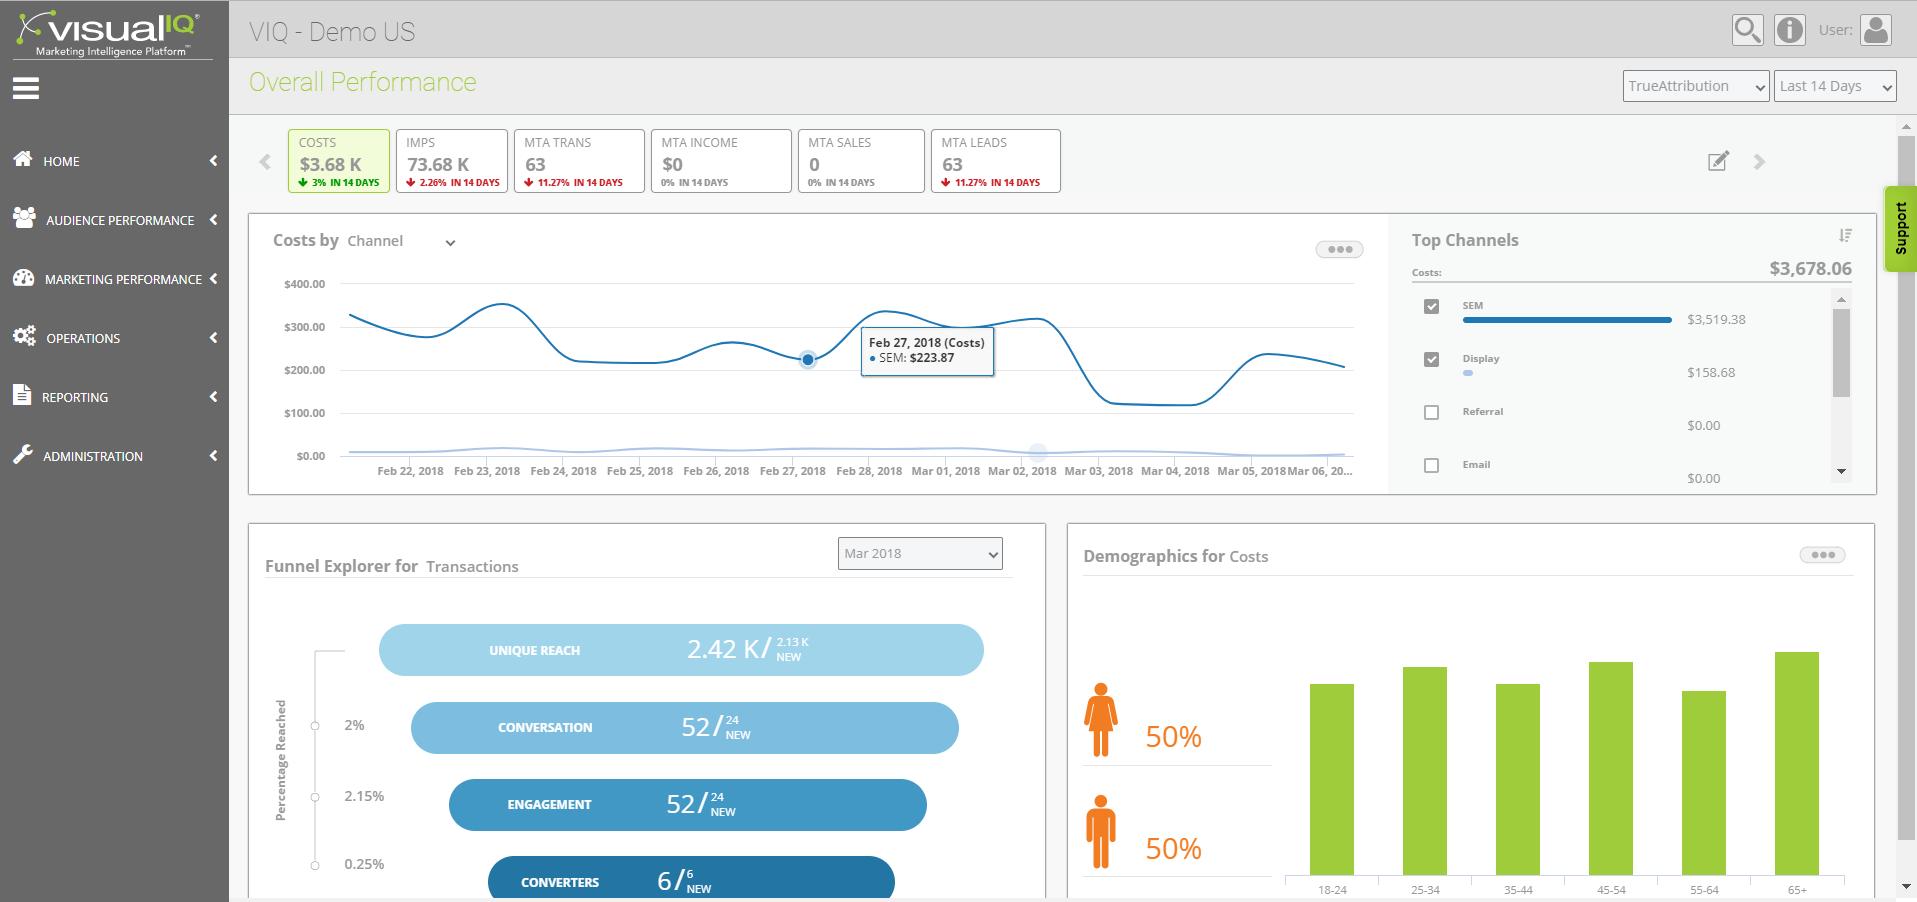 visual IQ Demo - Visual IQ Marketing Intelligence Platform - Overall Performance Page